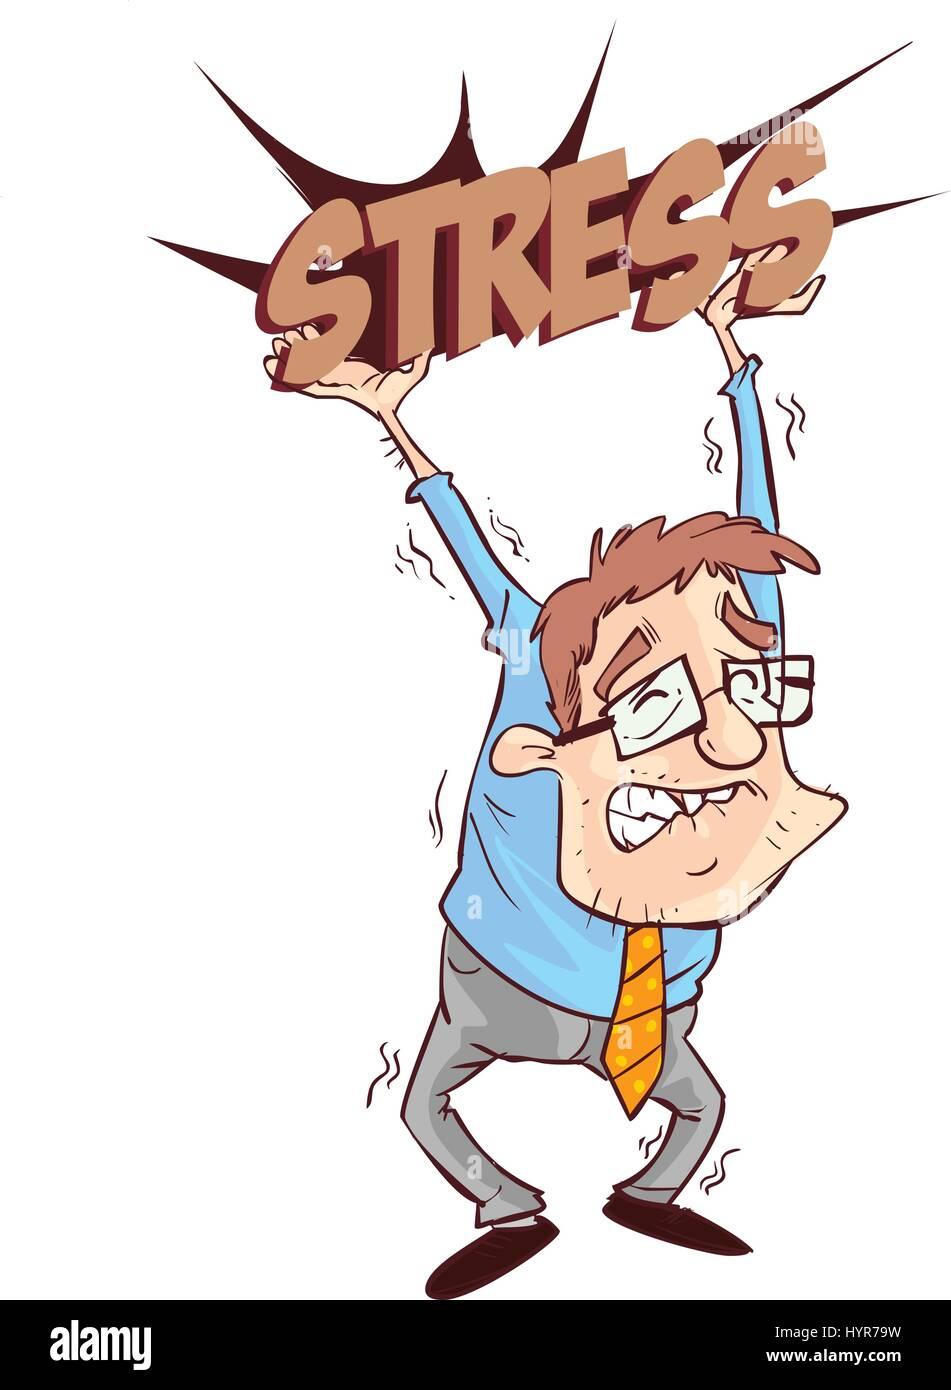 vector illustration of a business man oppressed under depression - Stock Vector